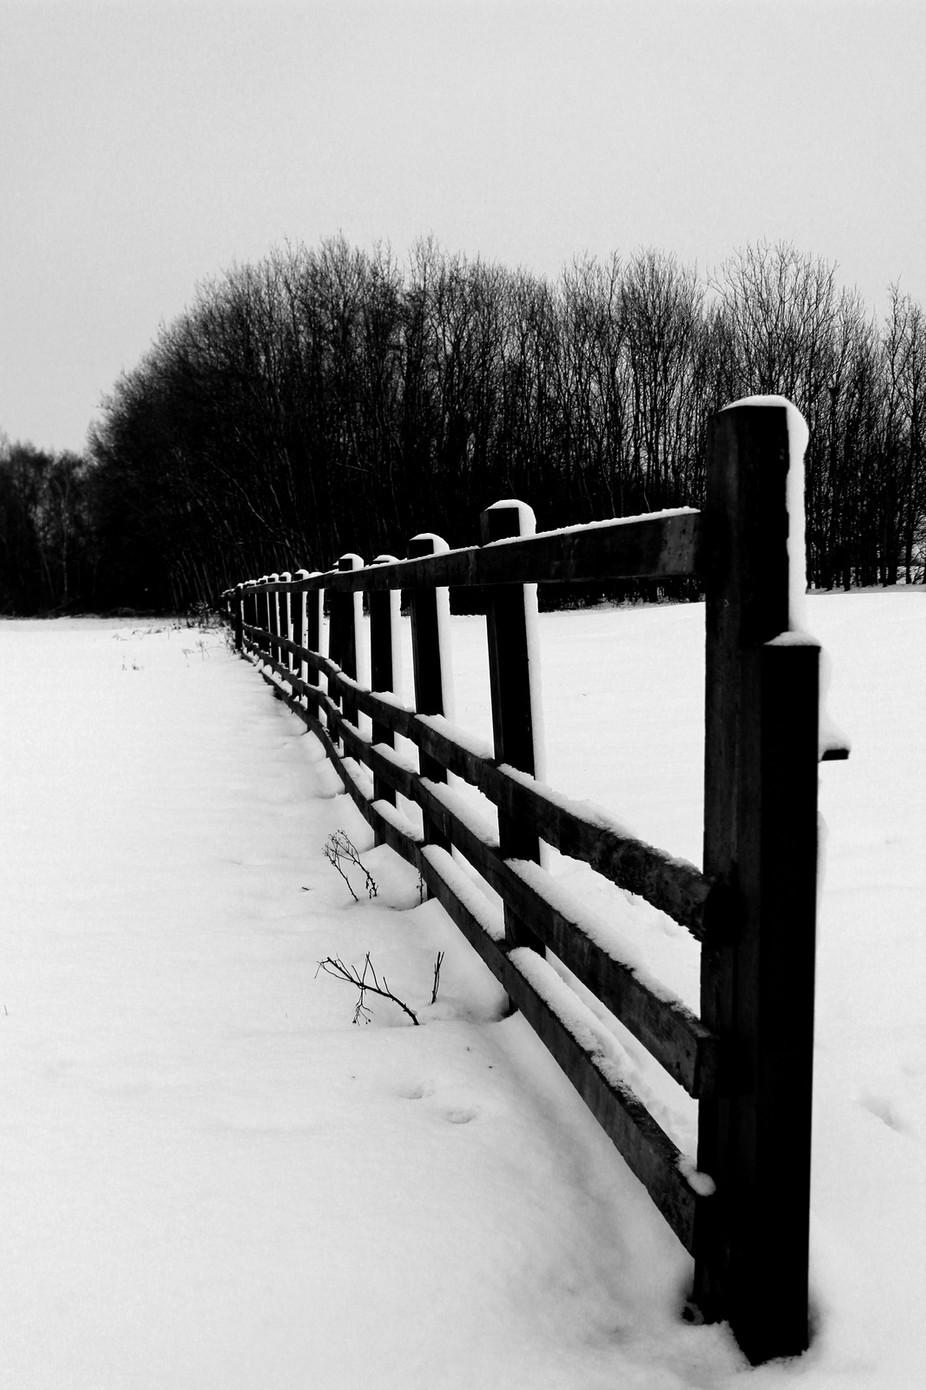 Snowy day in Northampton.